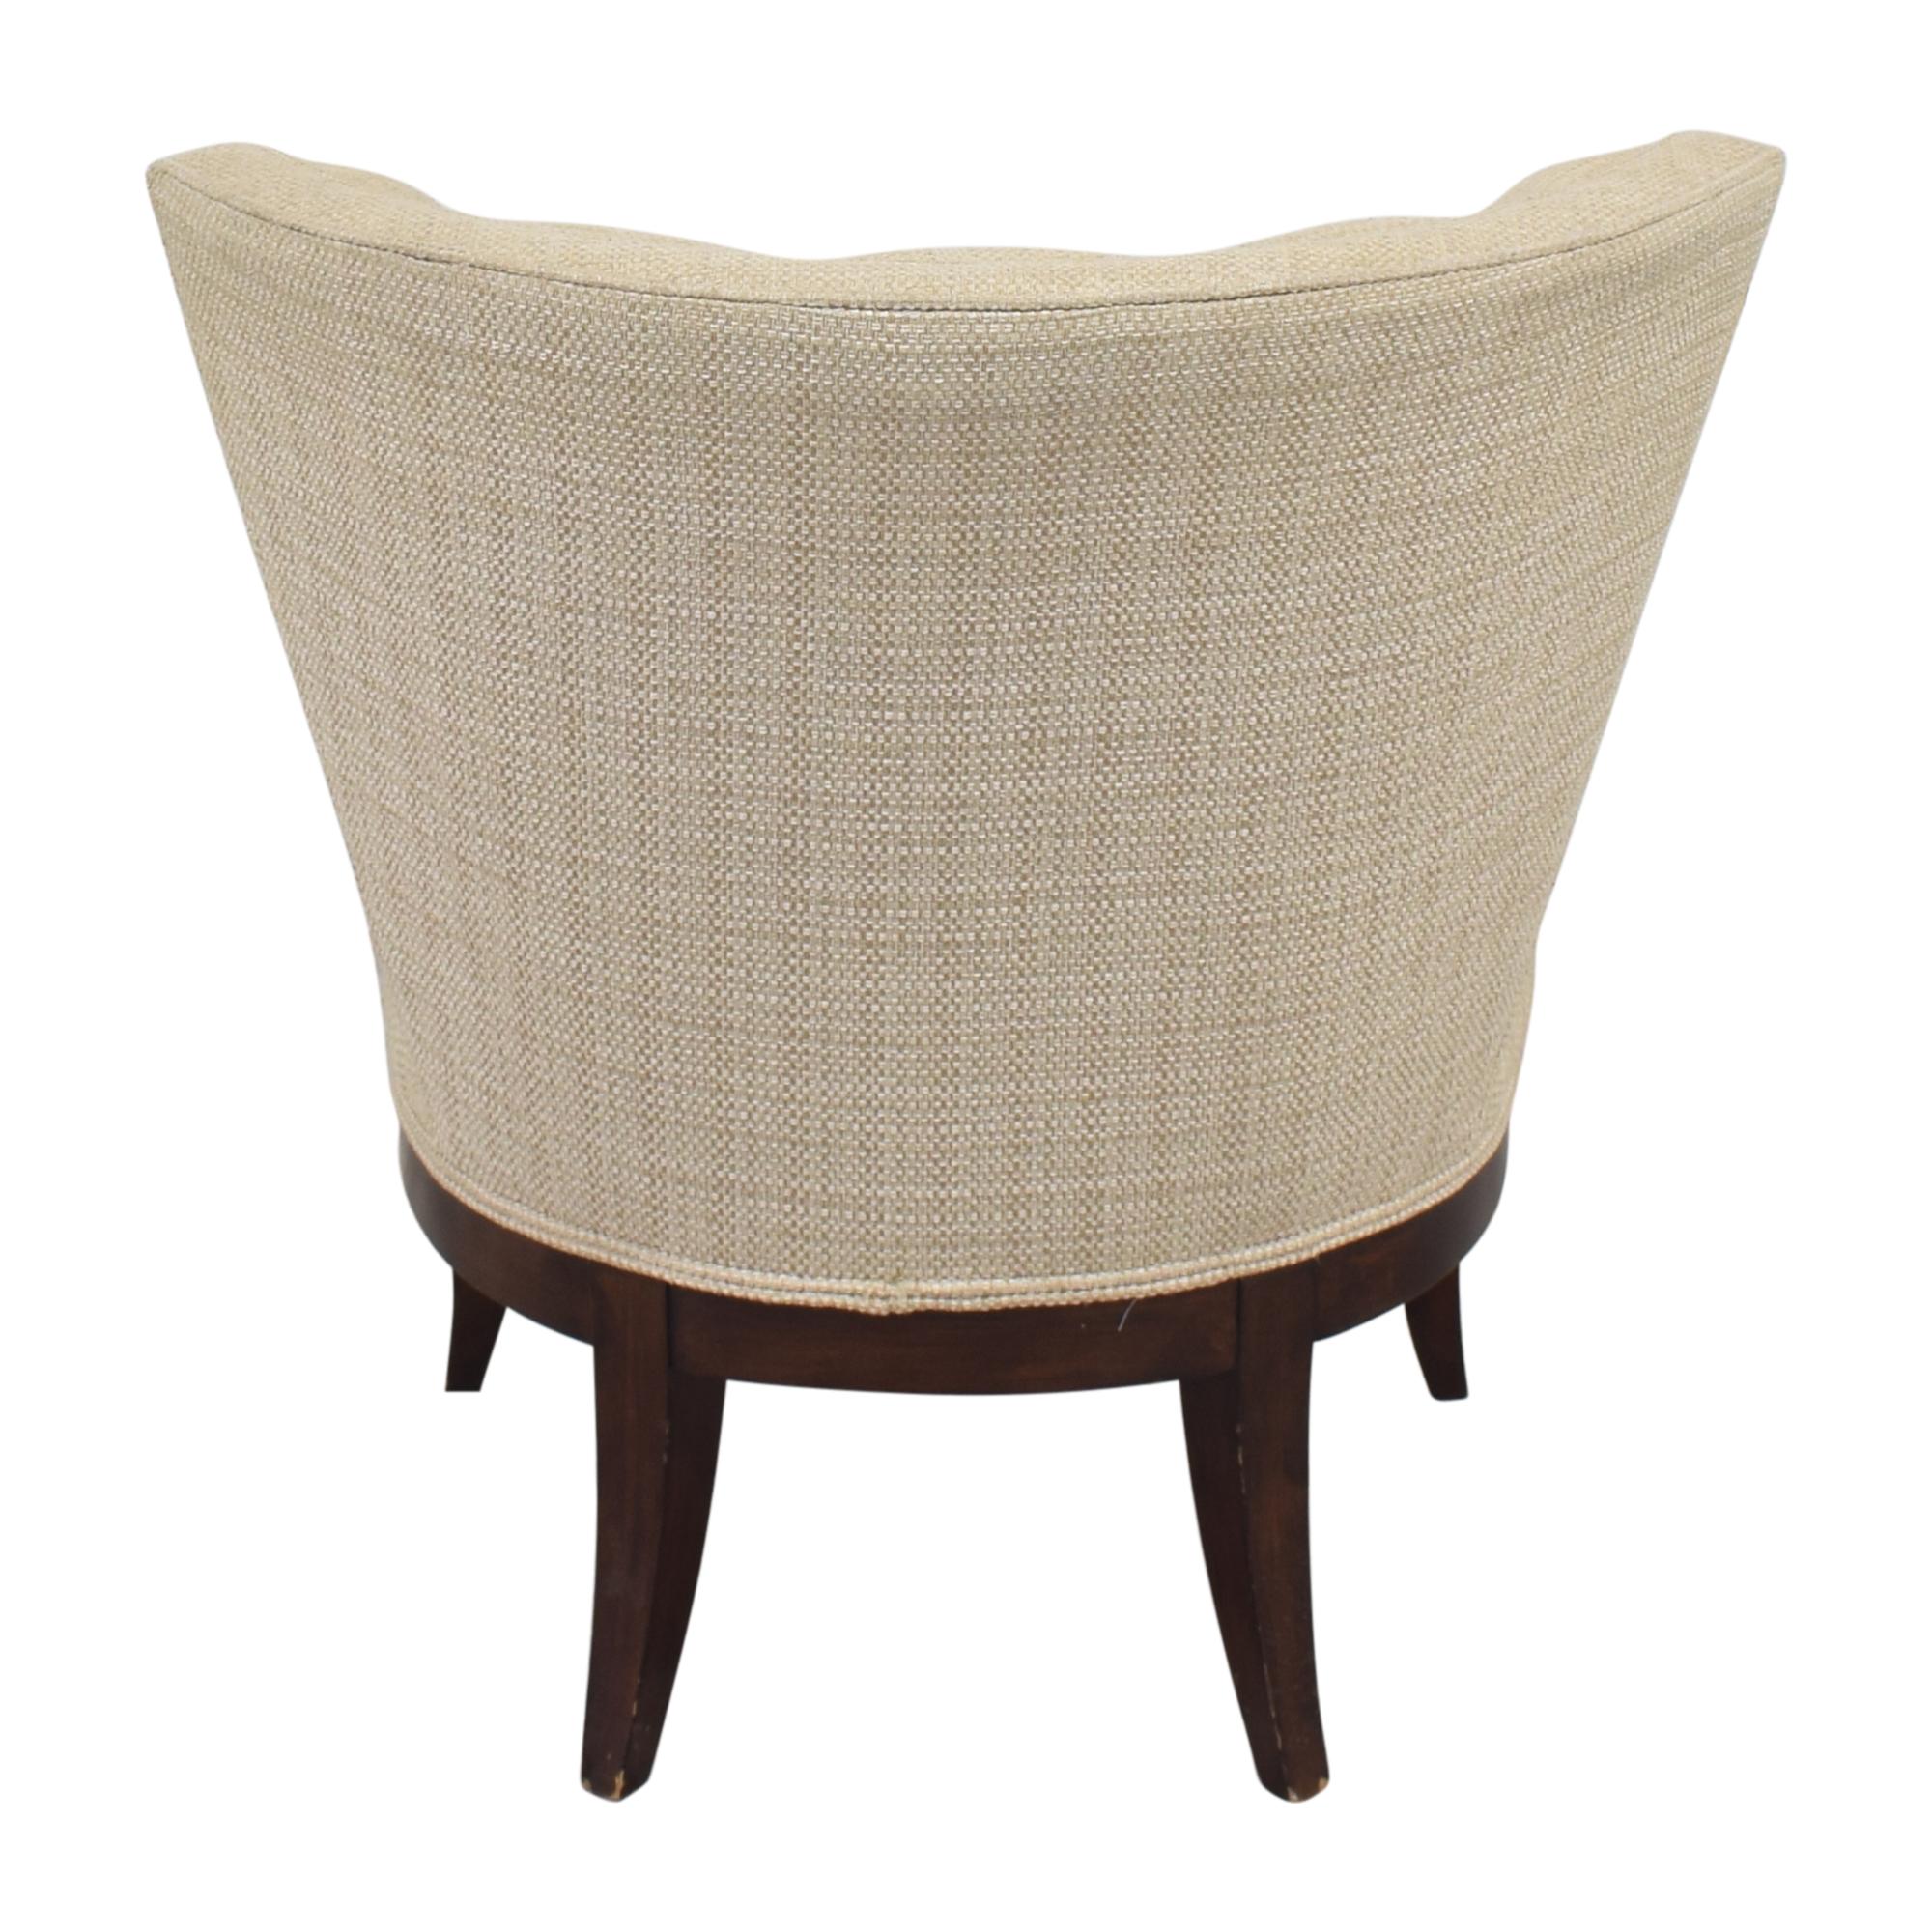 Schnadig Schnadig Ava Chair ma